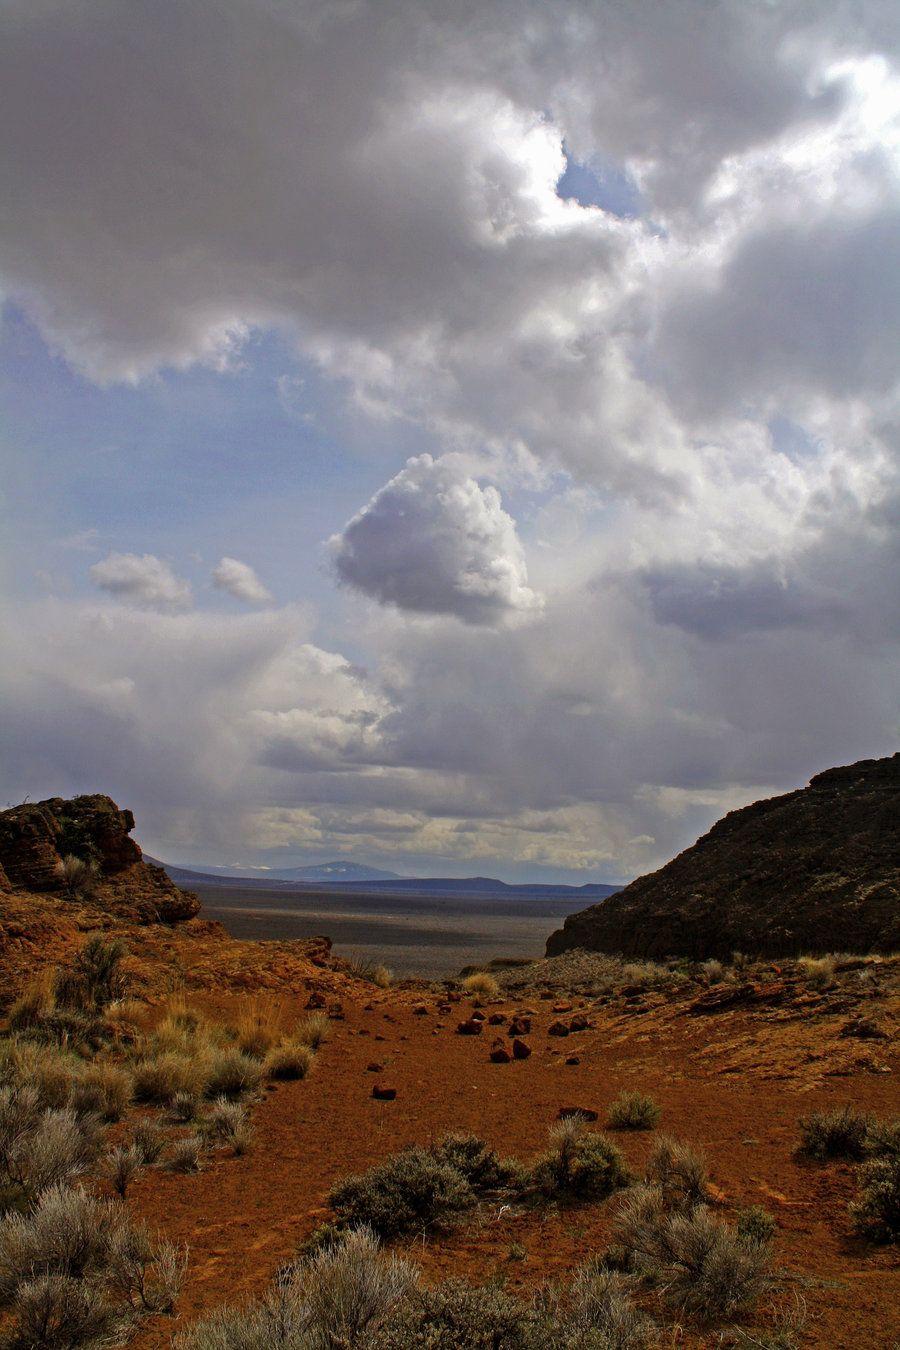 Thunder at the Rock by Thundercatt99.deviantart.com on @deviantART